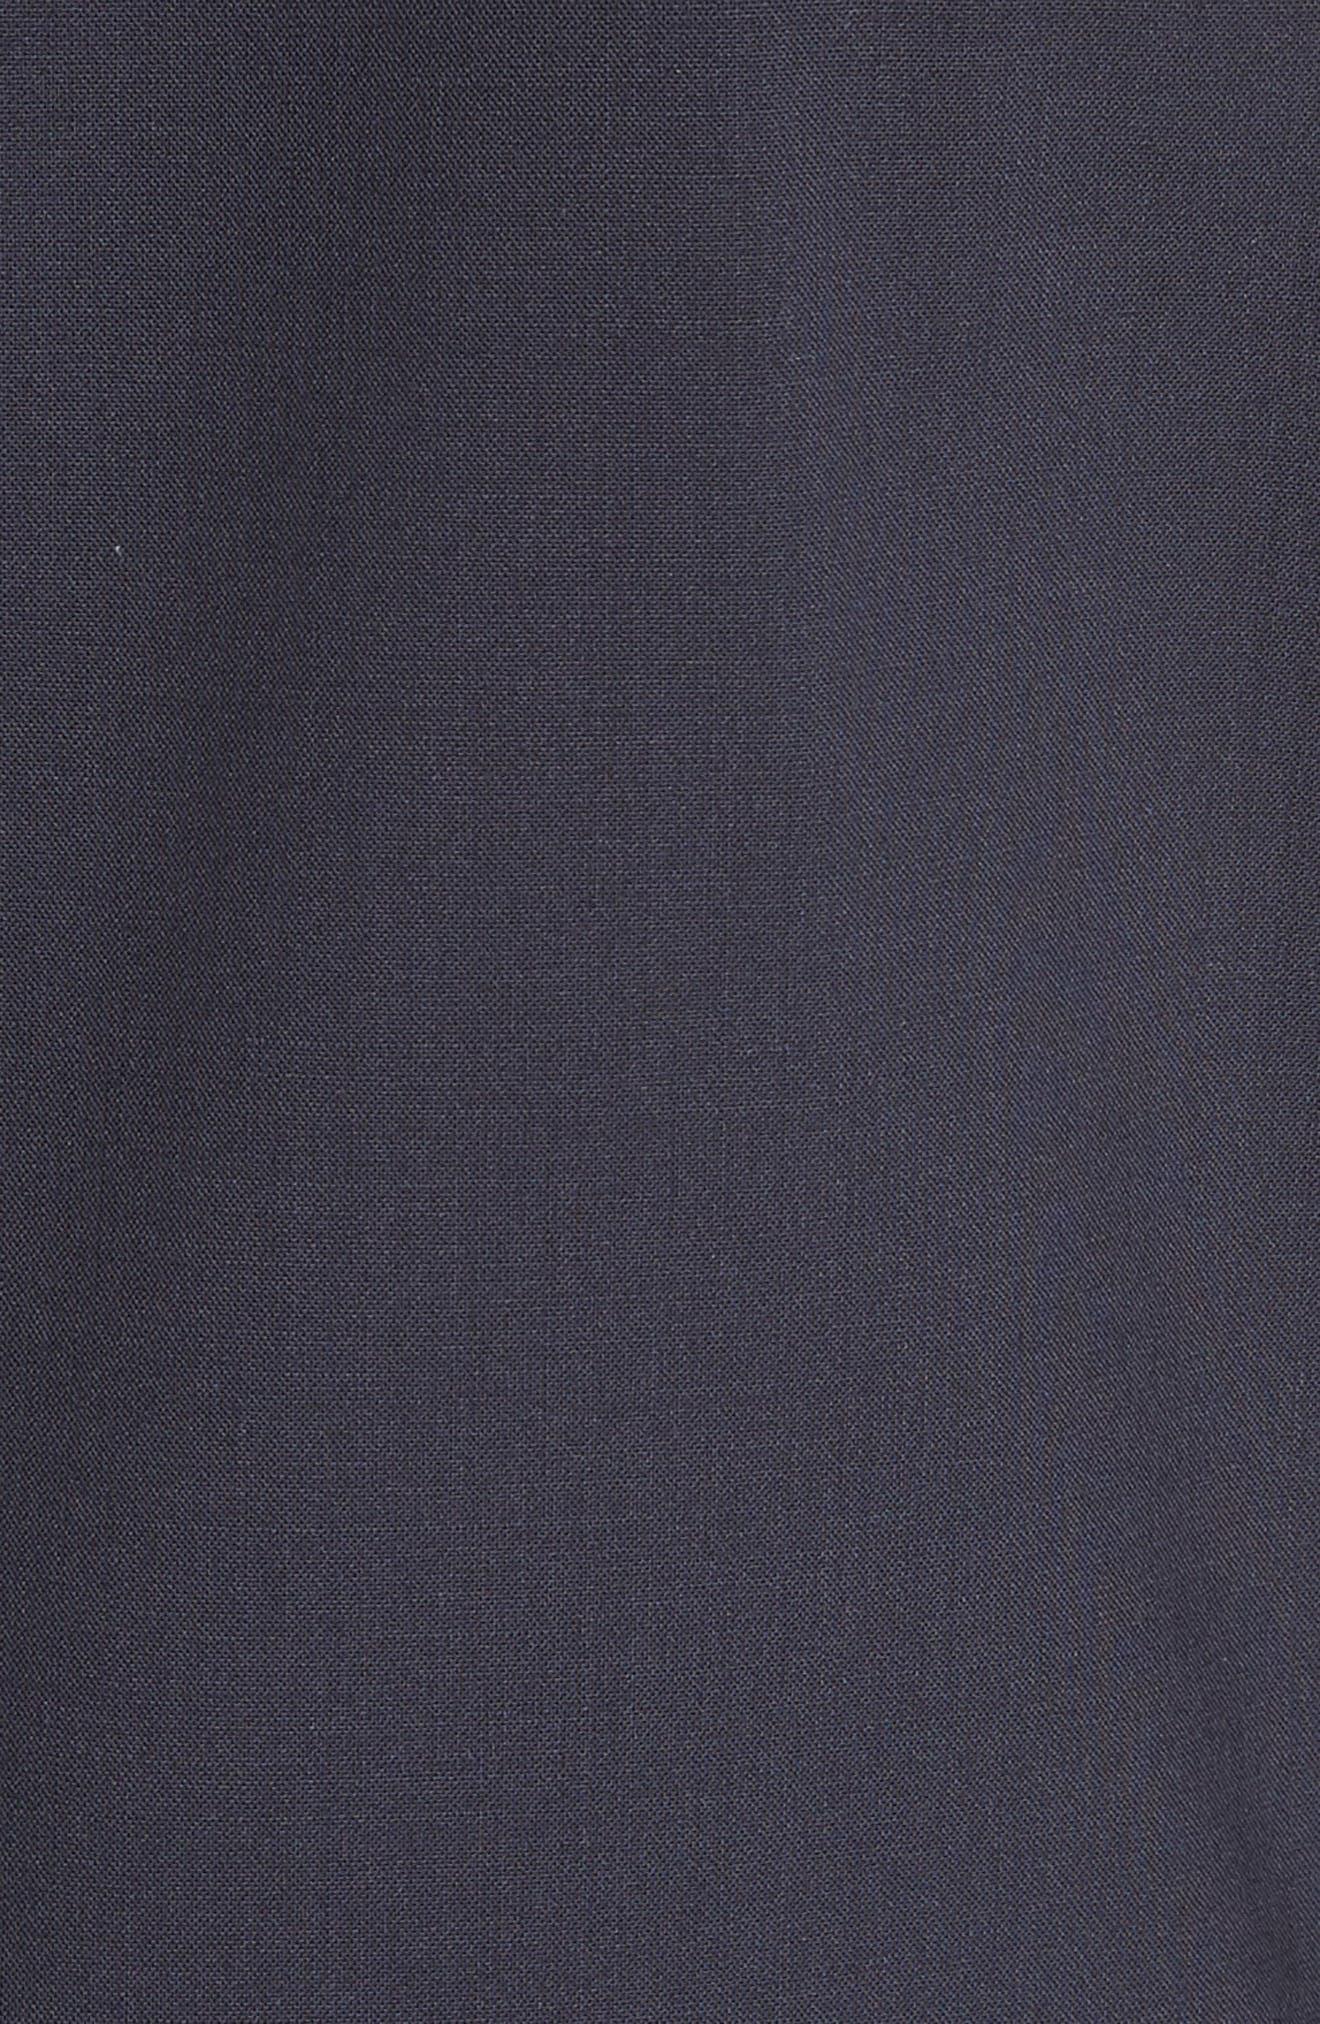 Audra Wool Blend Blazer,                             Alternate thumbnail 6, color,                             479